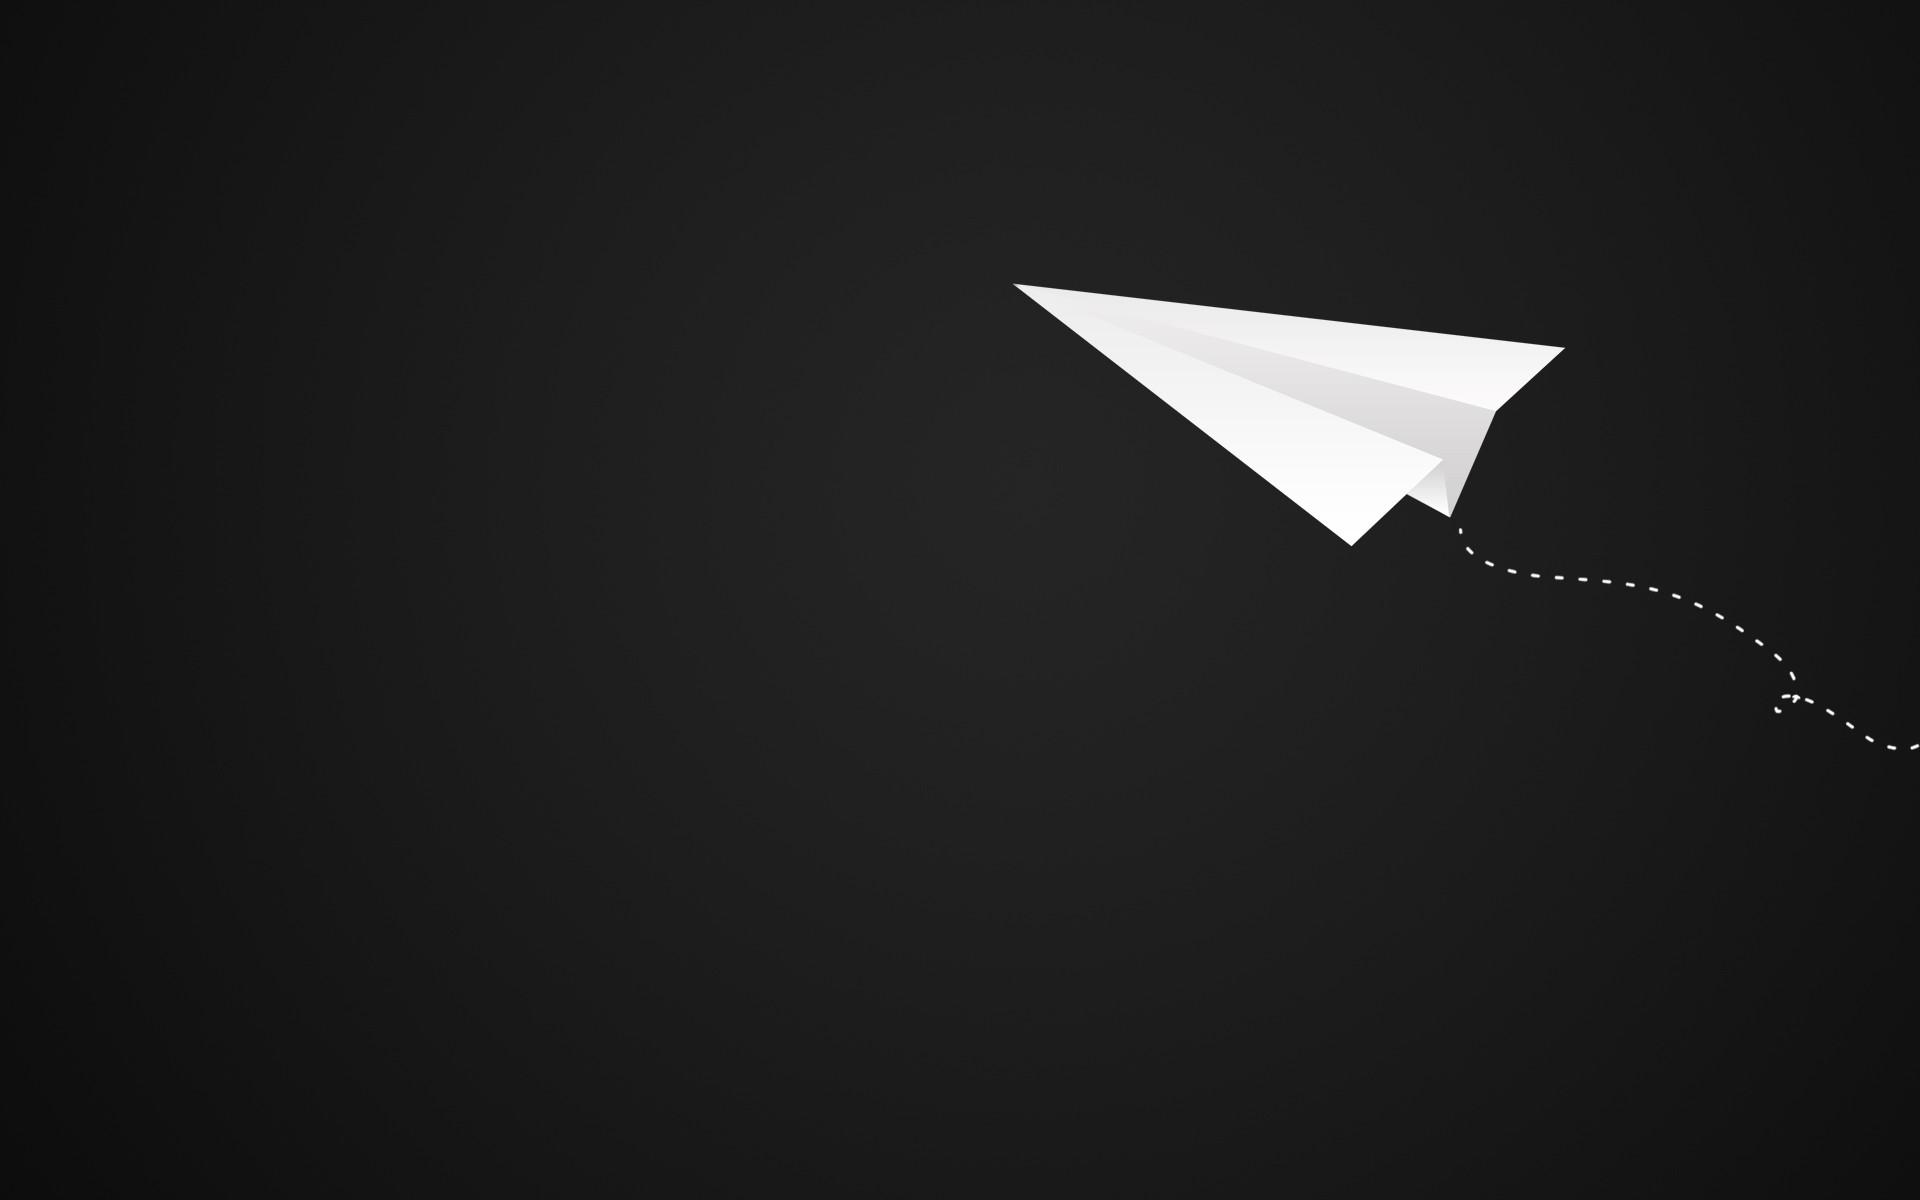 paper airplane desktop wallpaper 58076